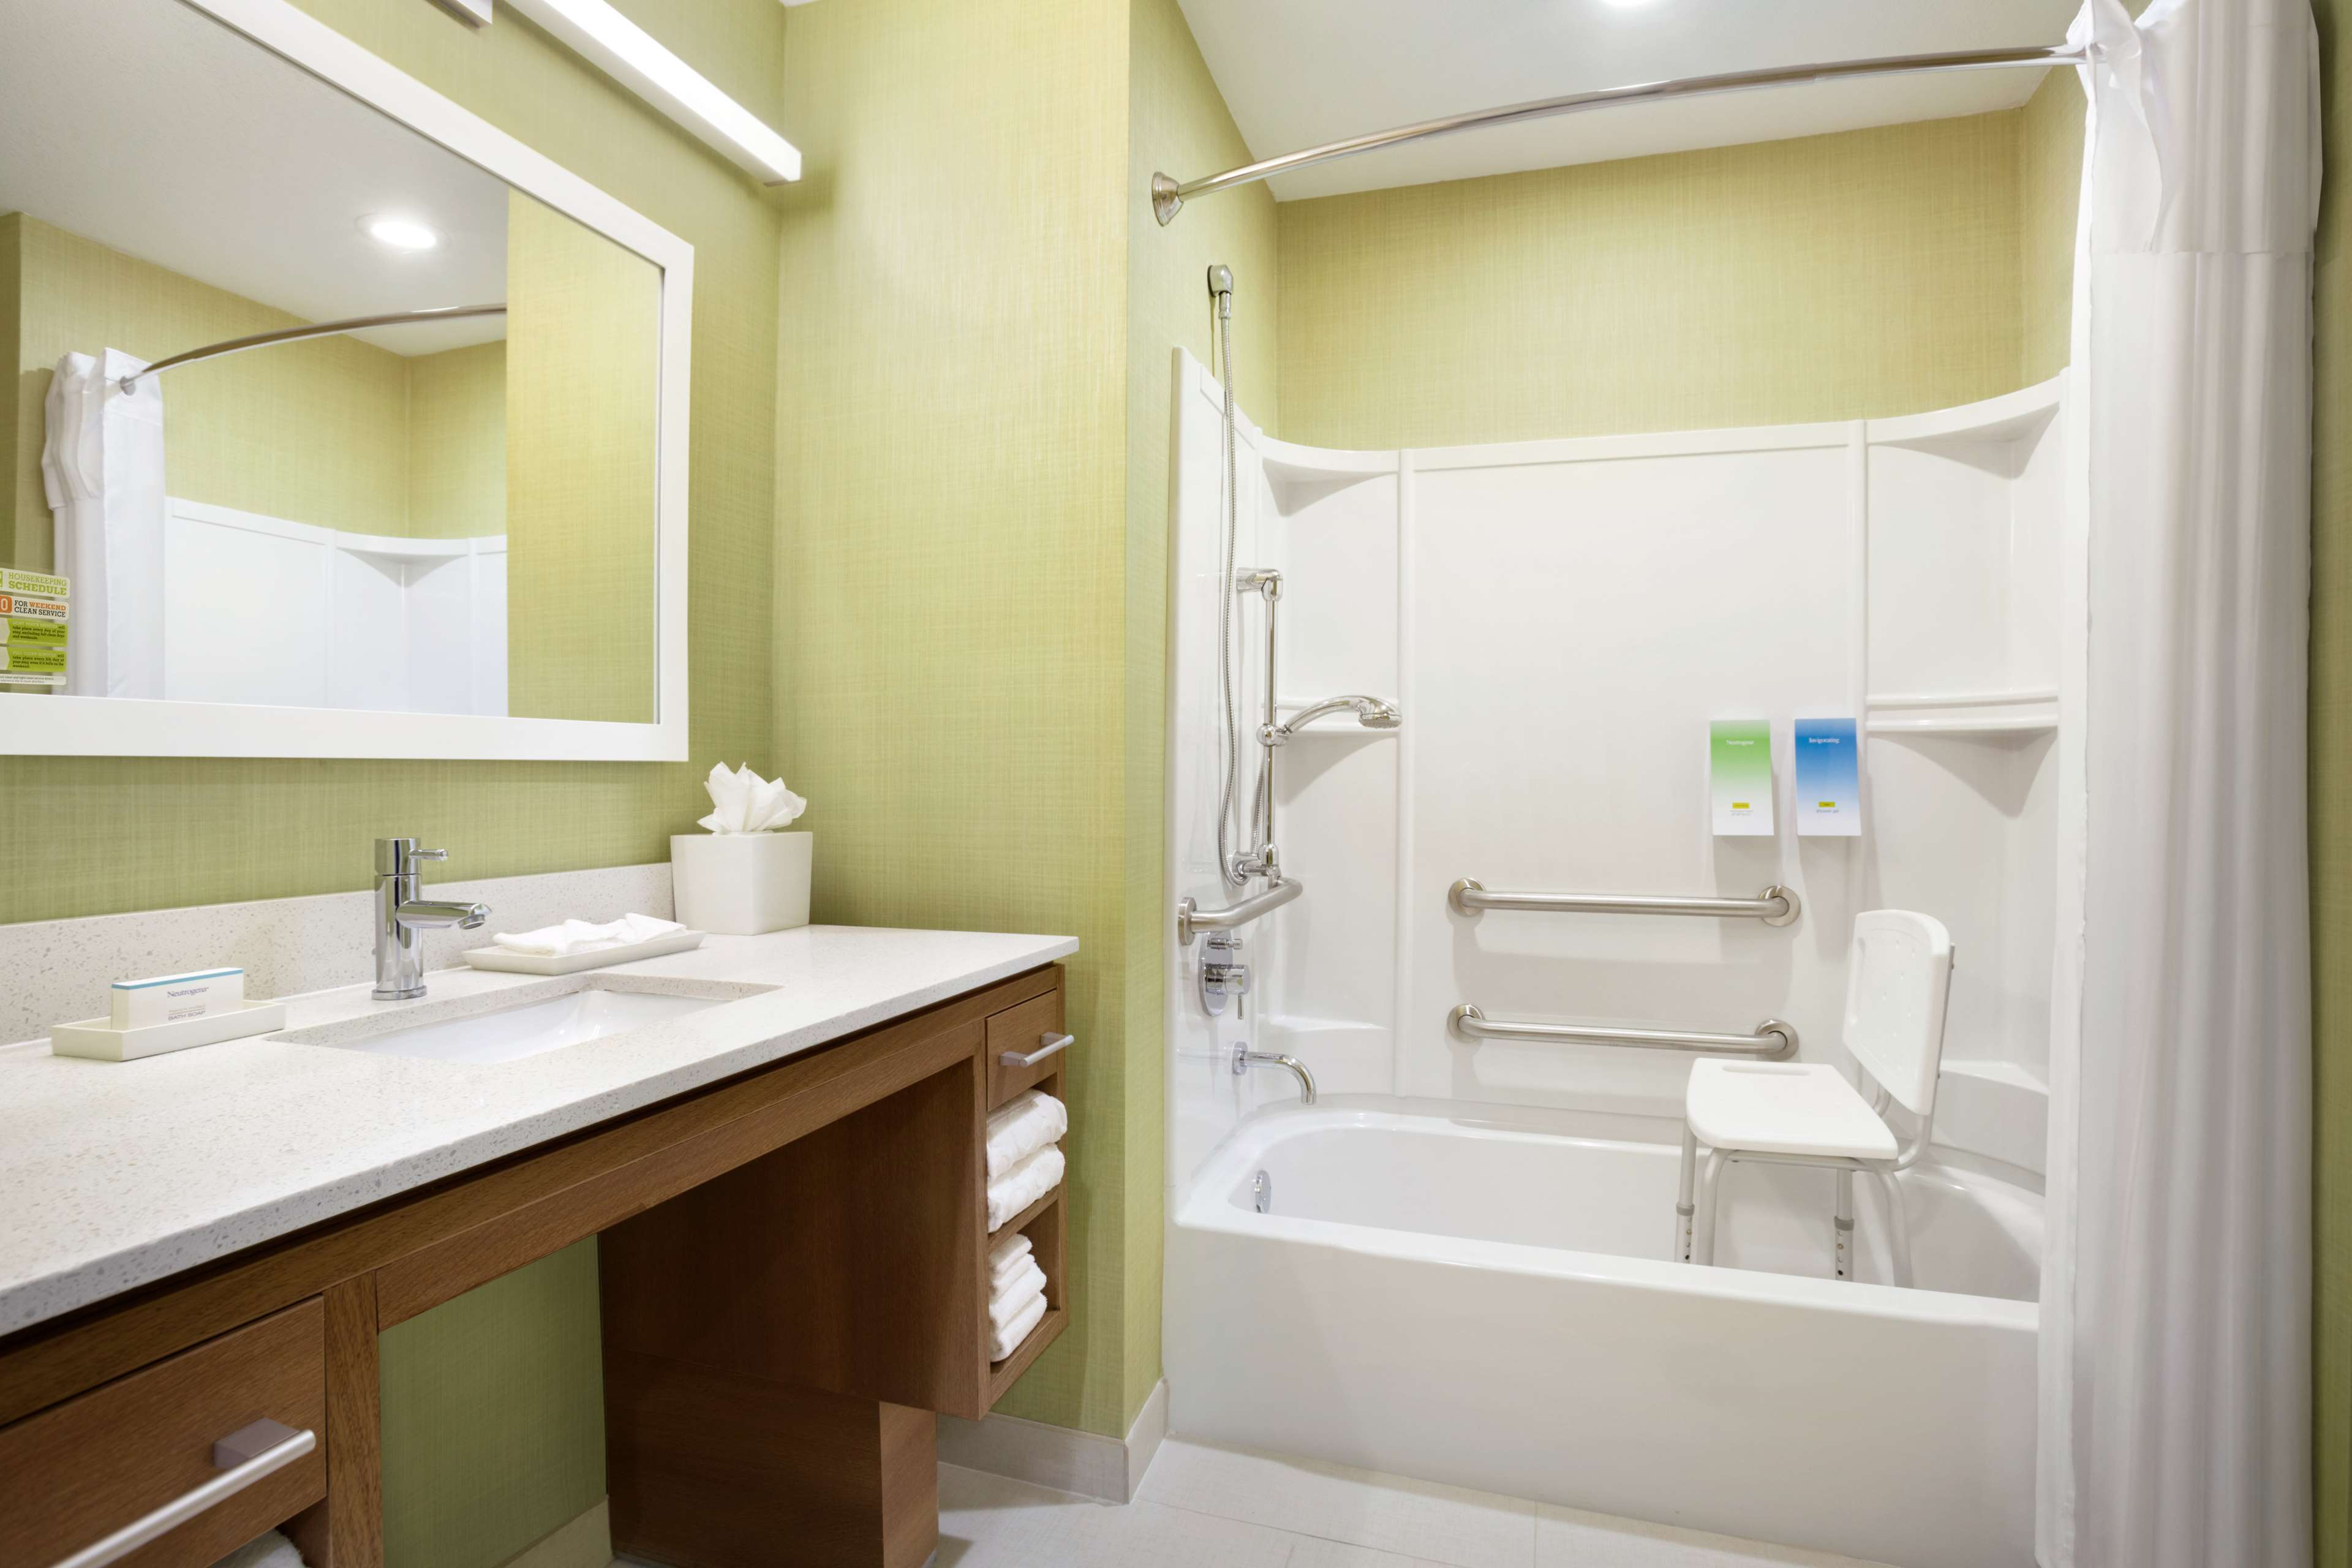 Home2 Suites by Hilton Houston/Webster image 12